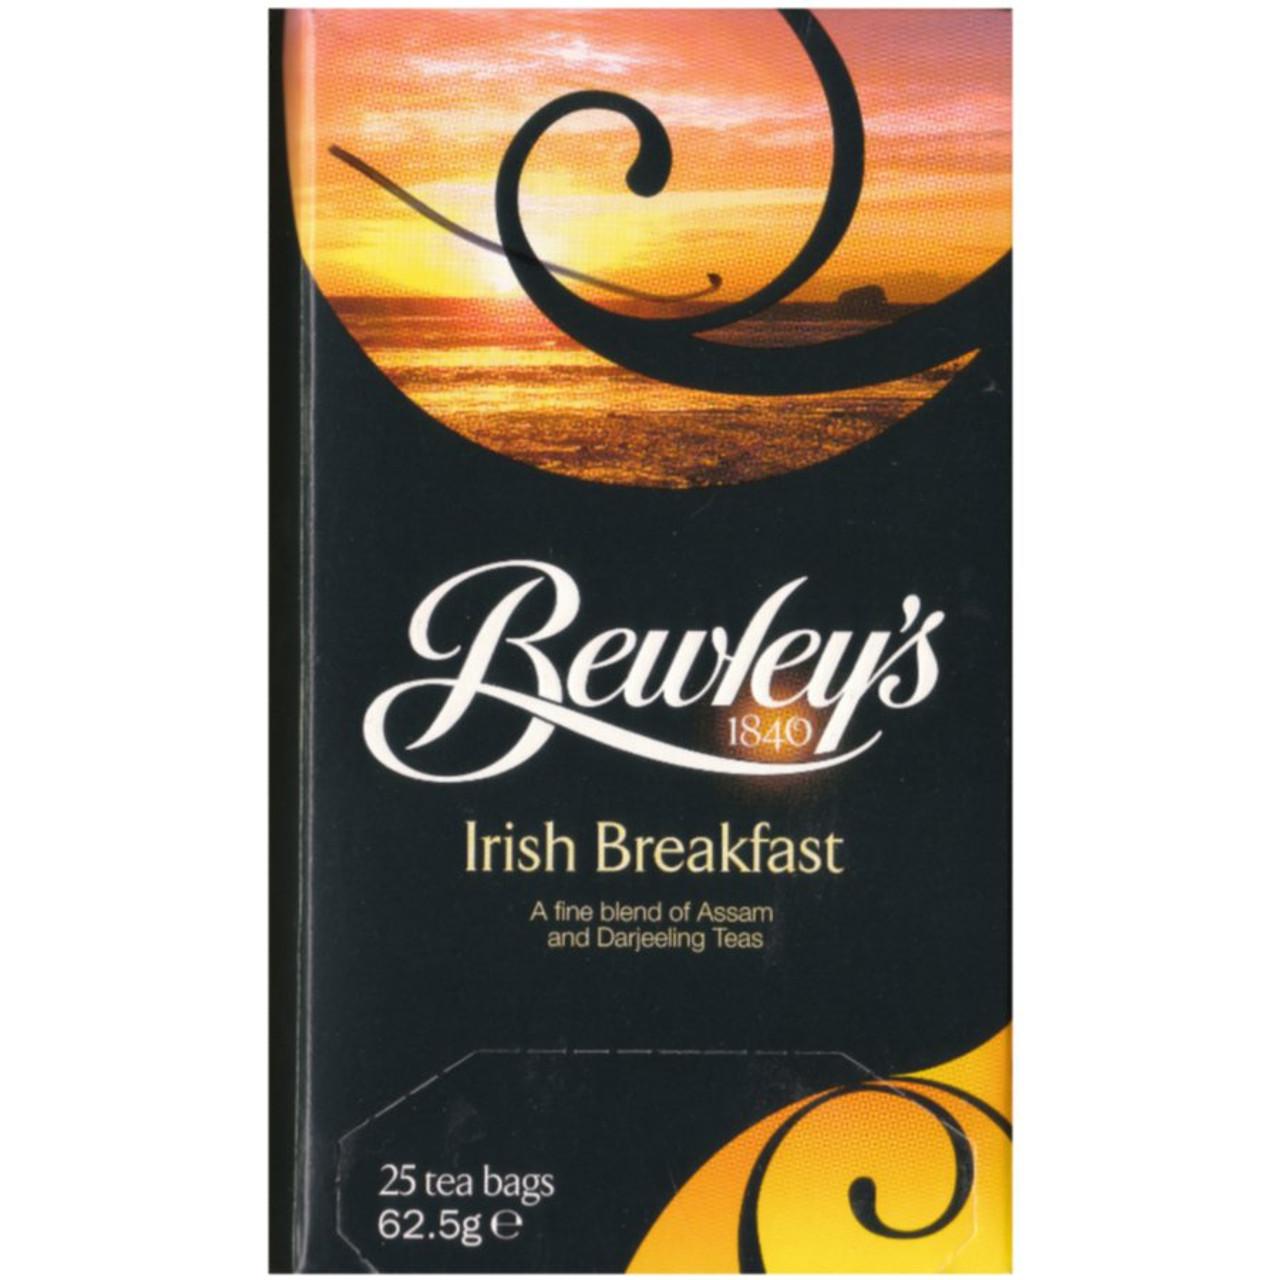 Best Bags 2020 Bewley's Irish Breakfast 25 Individually Wrapped Tea Bags (Best By